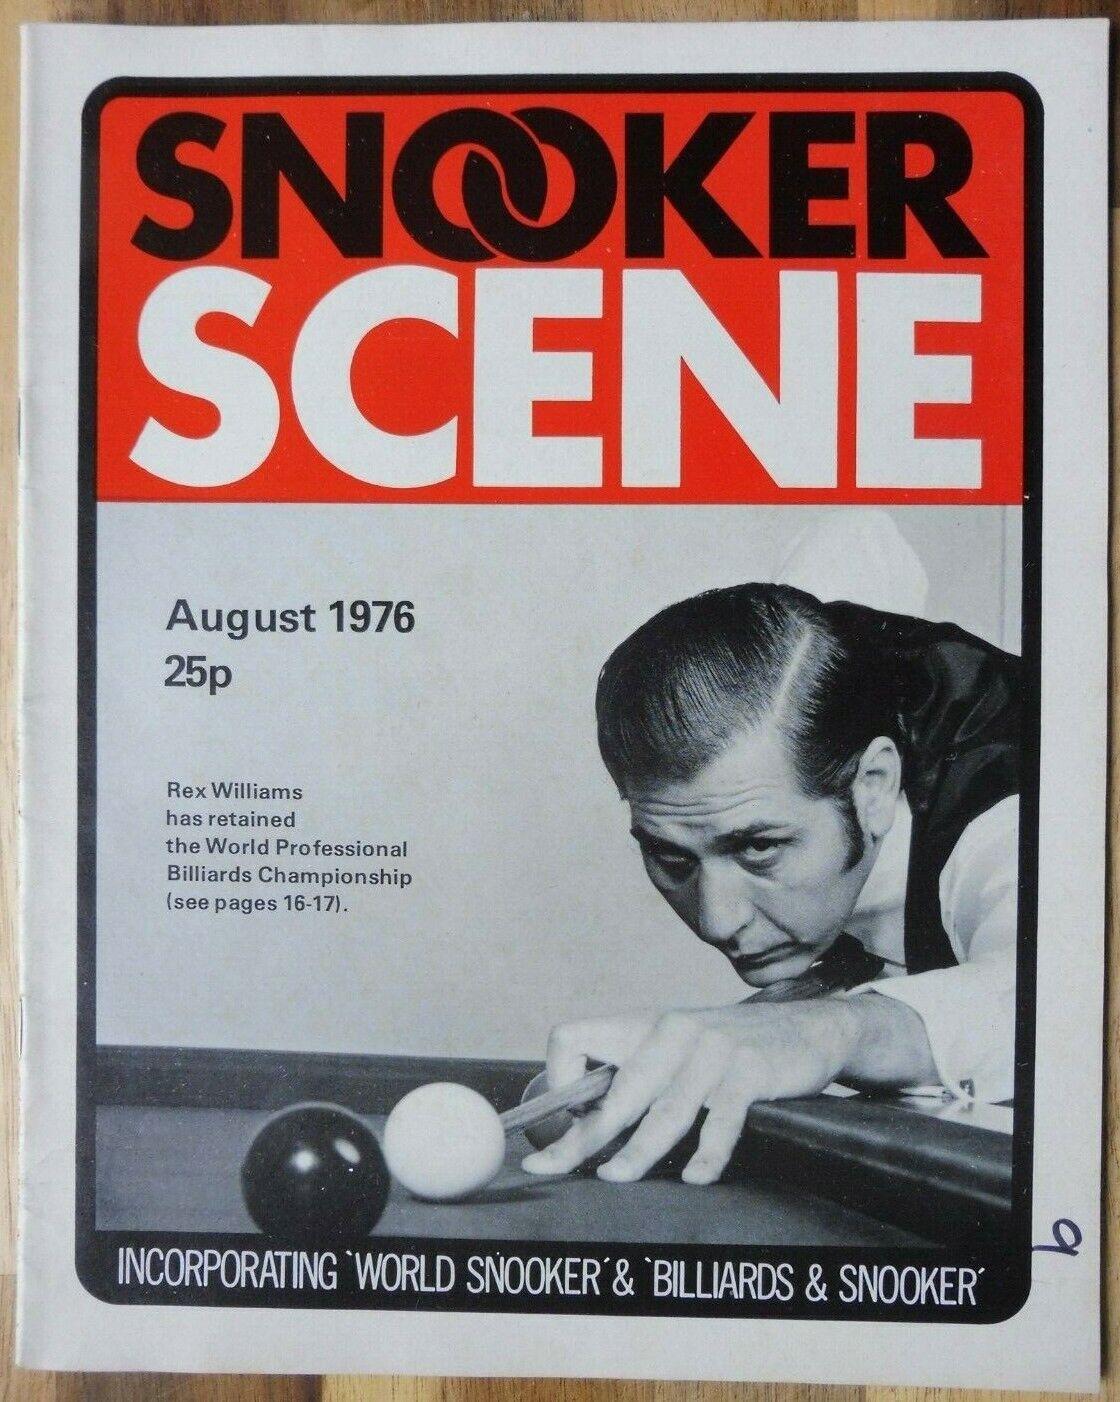 Snooker Scene Magazine, August 1976, Good Condition.